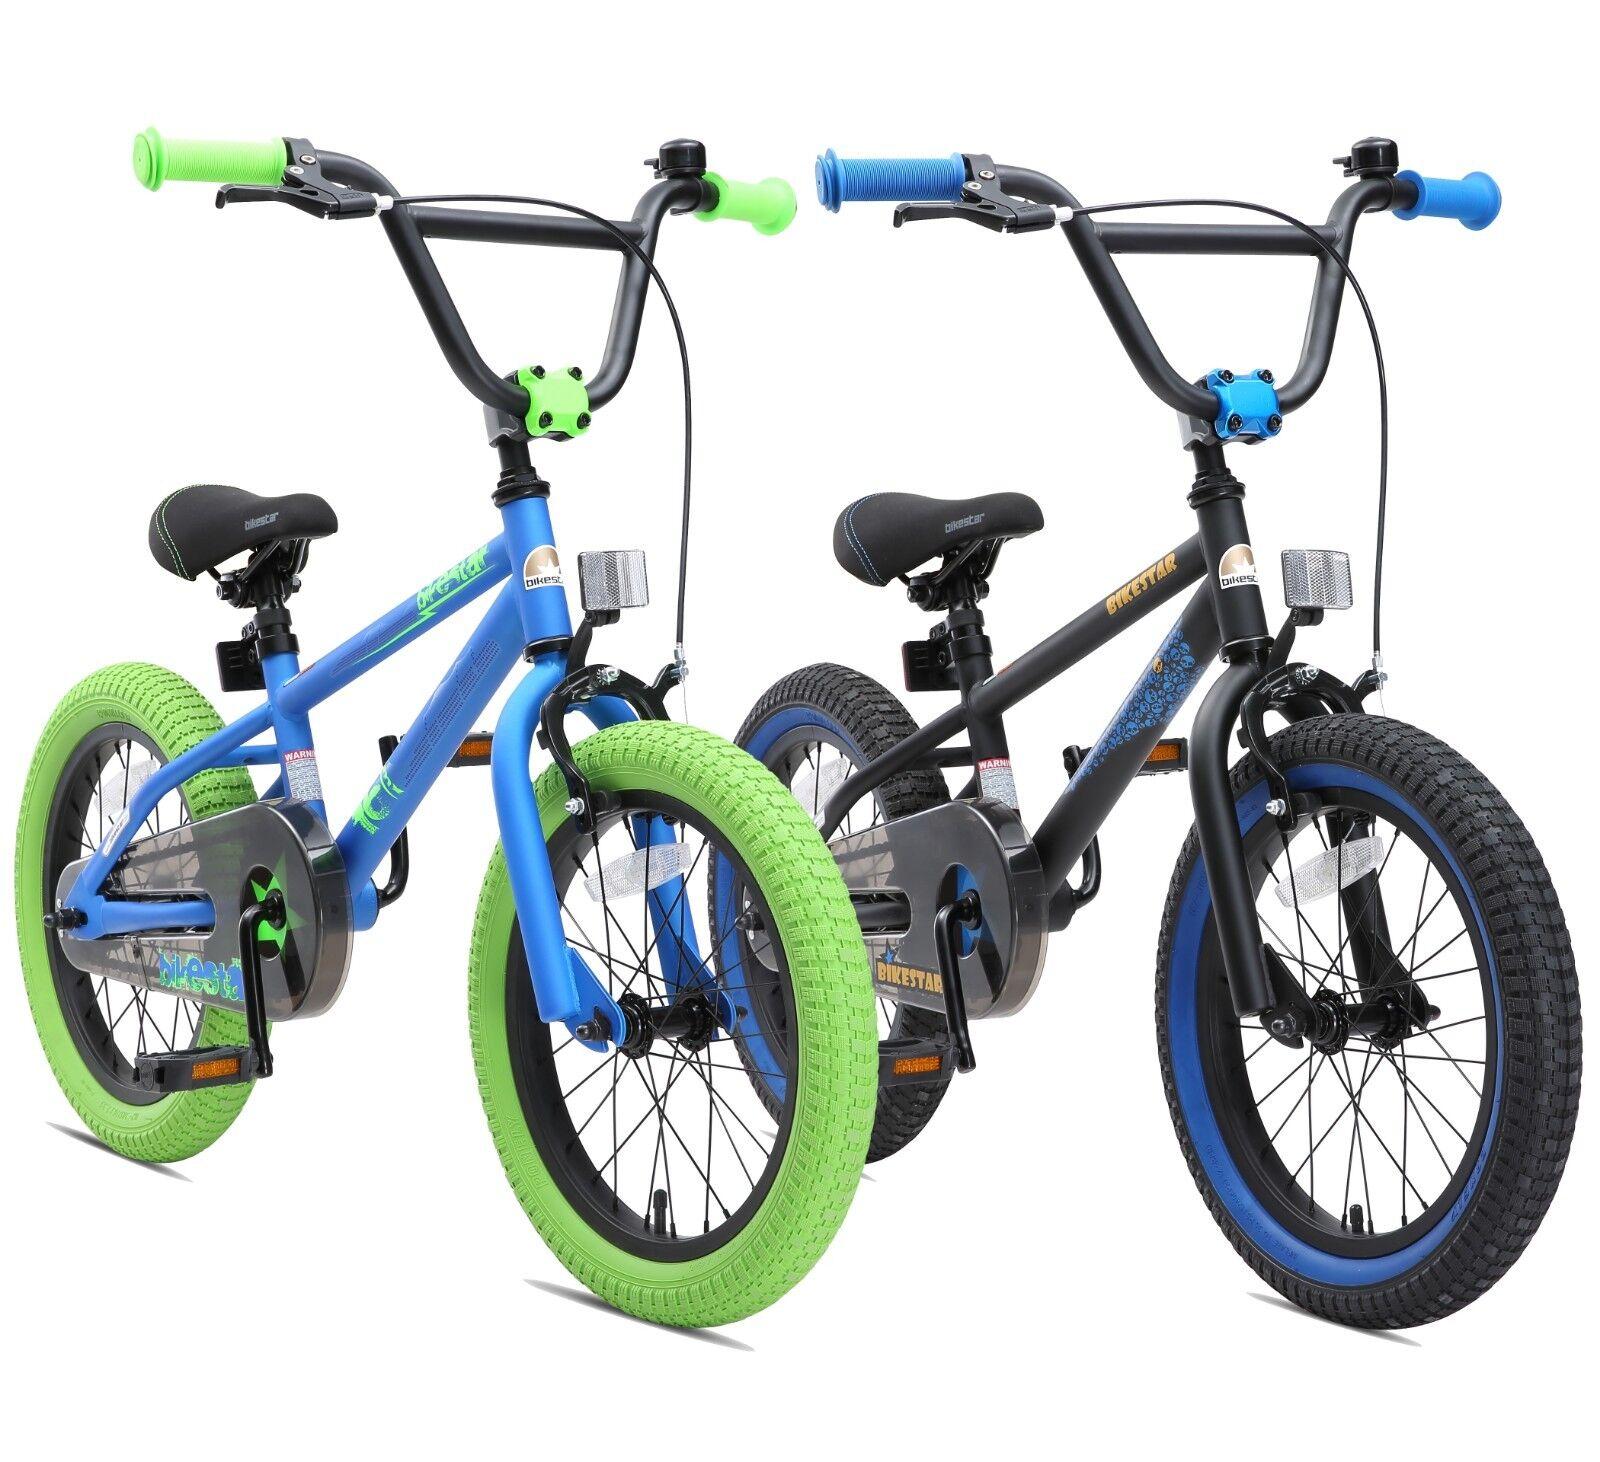 BIKESTAR Kinderfahrrad Kinderrad Fahrrad für Kinder ab 4 Jahre   16 Zoll BMX